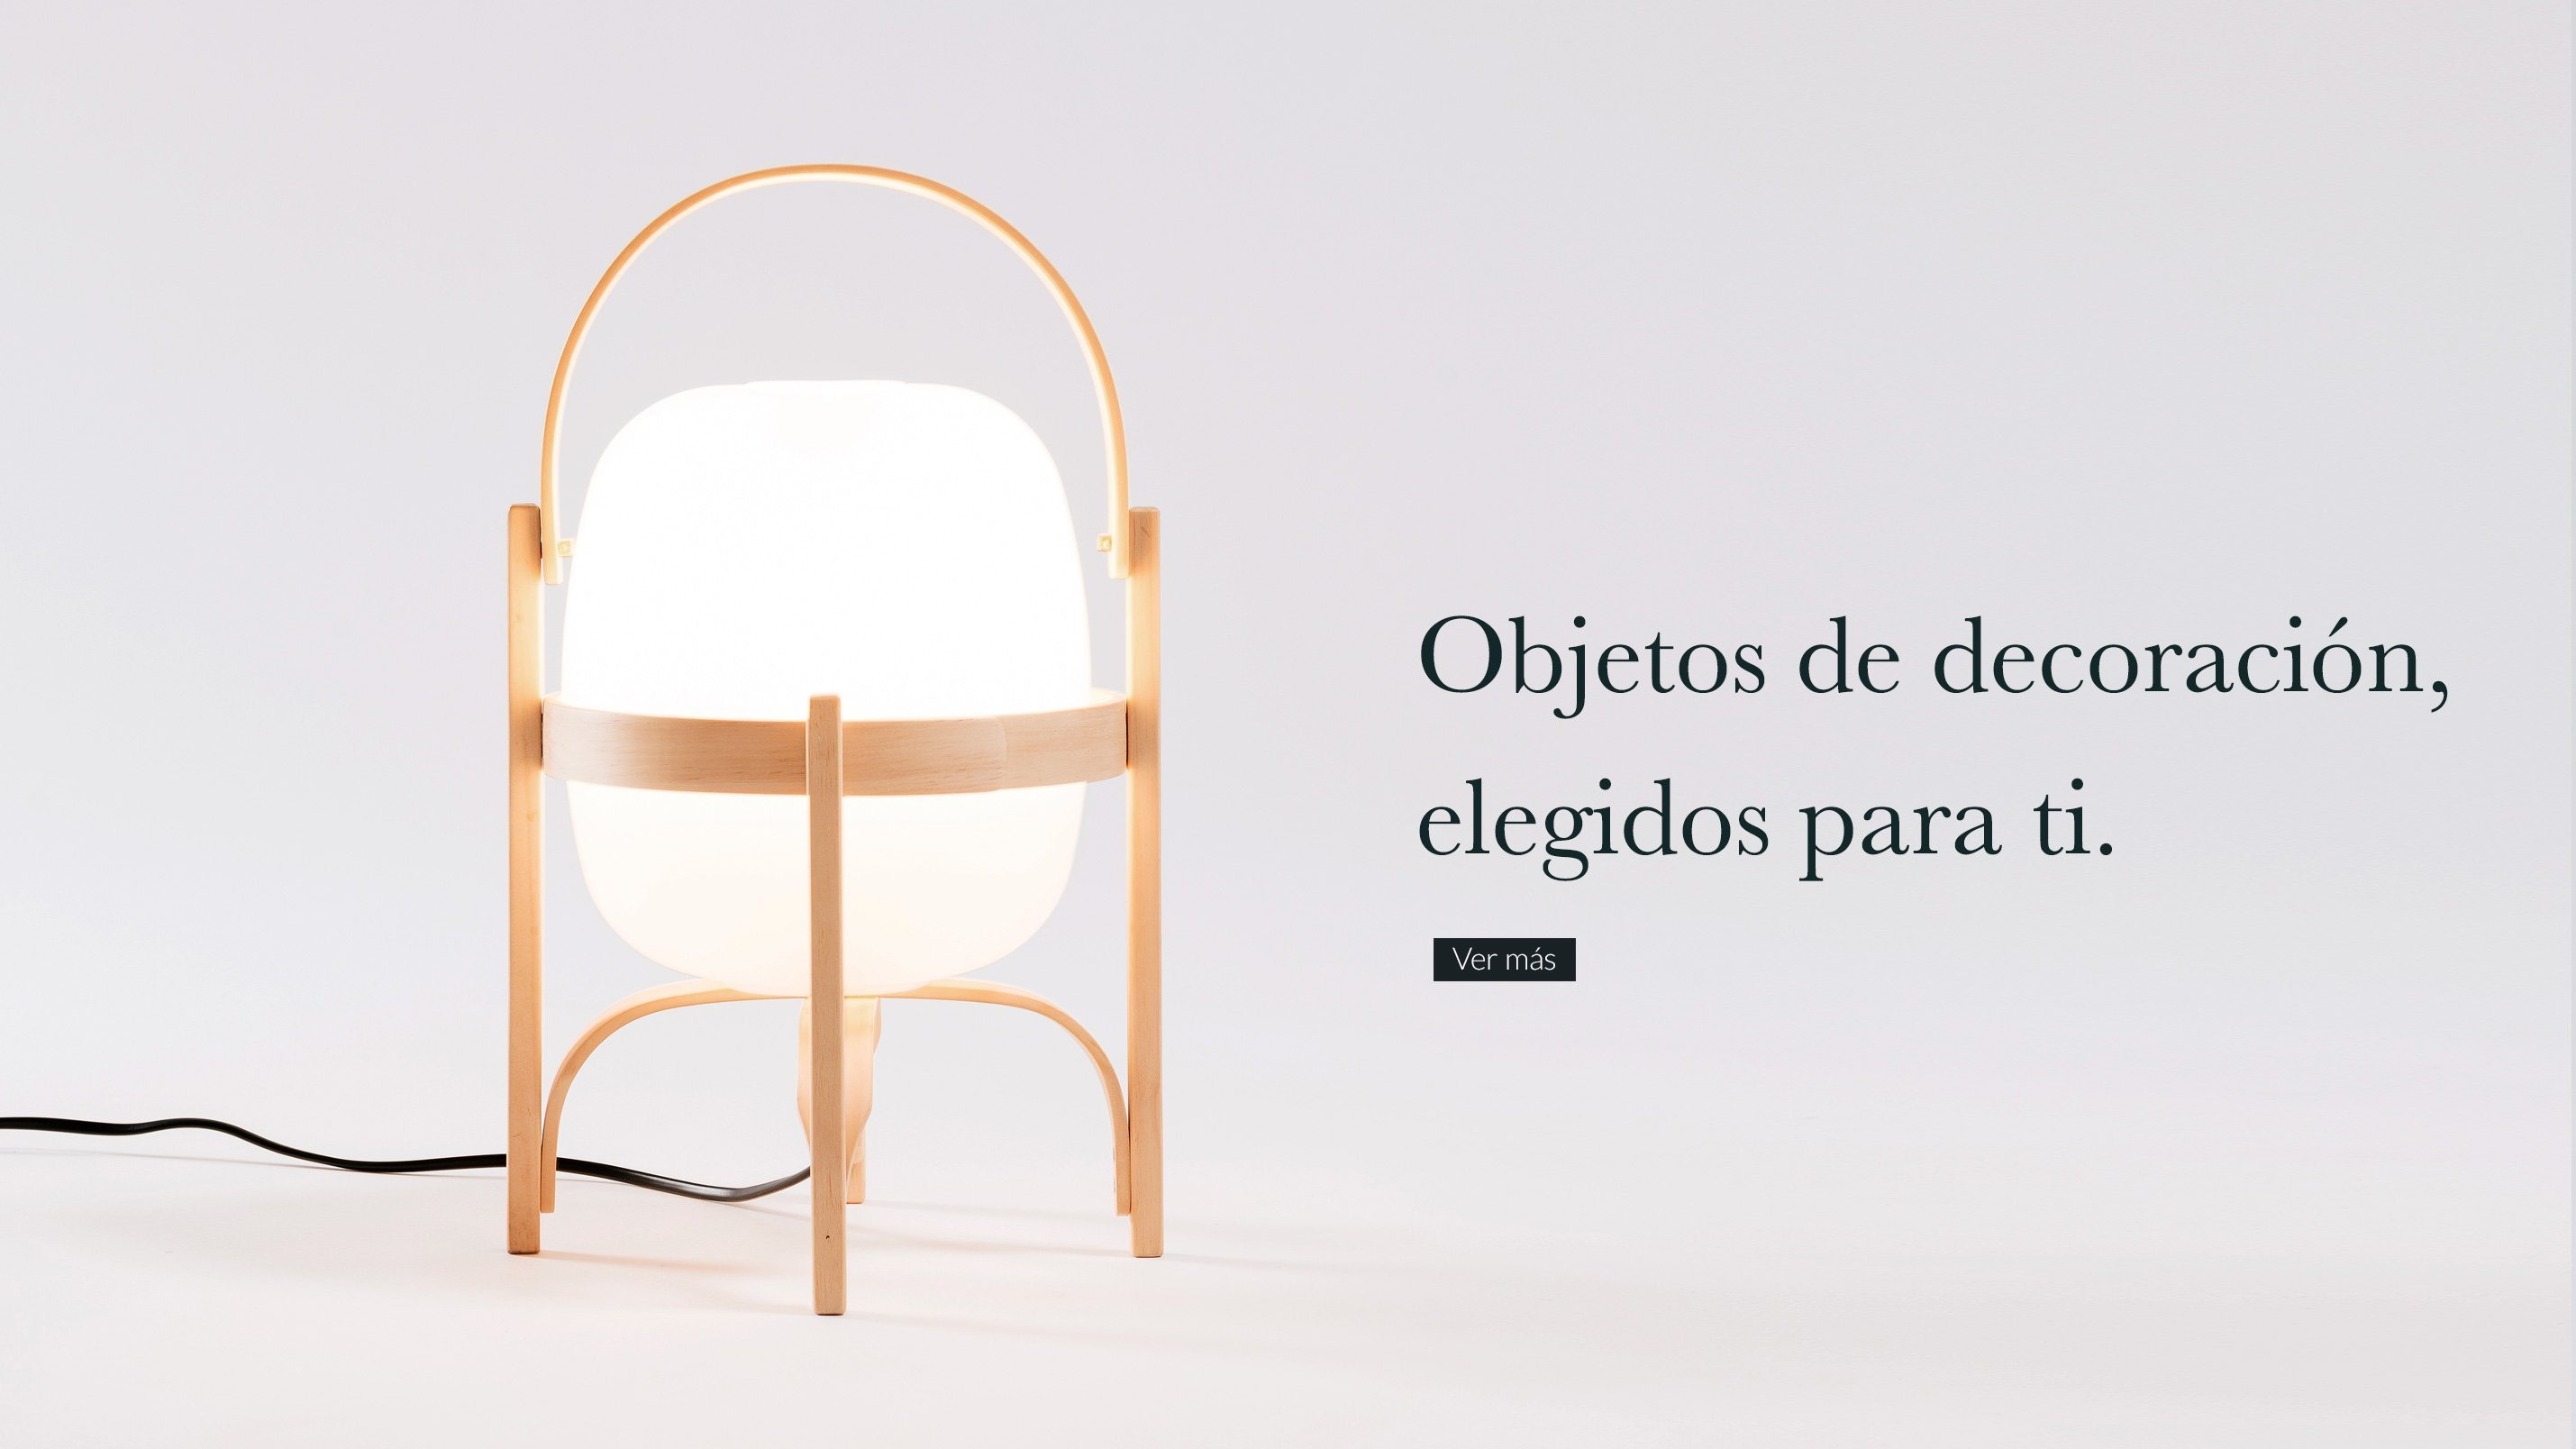 Muebles A Medida Muebles De Dise O Bois Et Fer # Muebles Umbe Horario